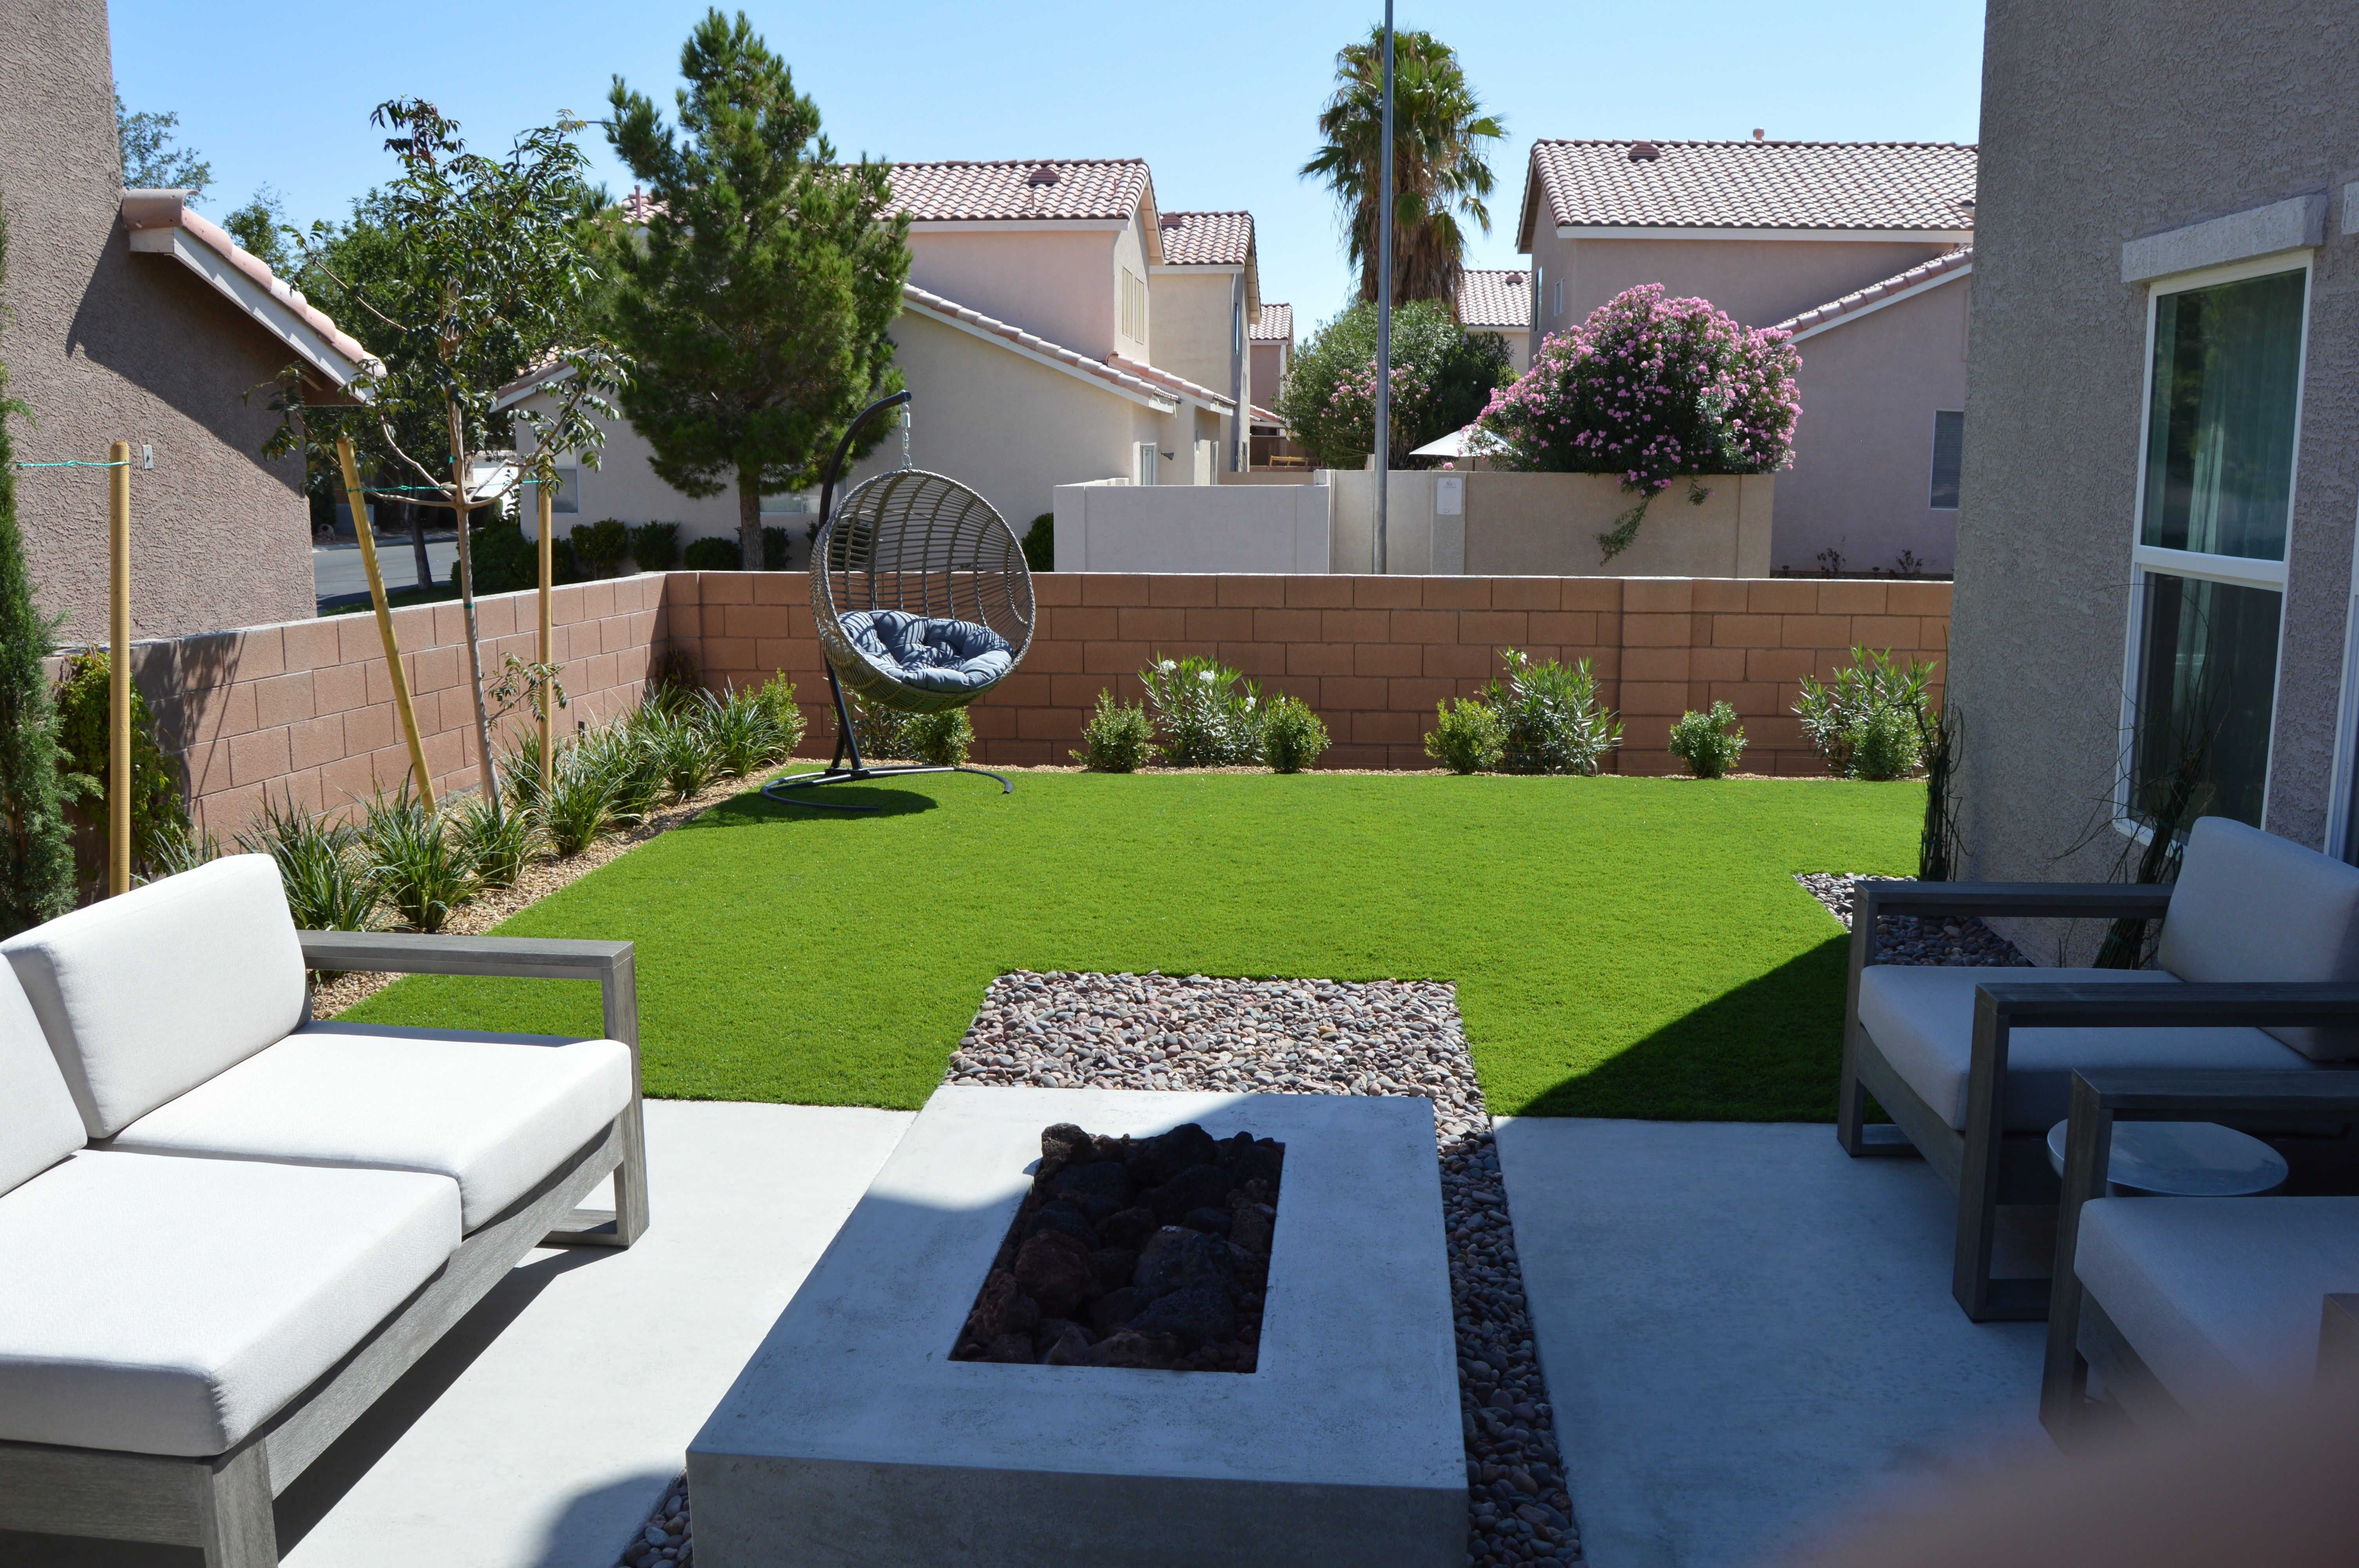 Las Vegas Backyard Landscaping Desert Landscaping Backyard Modern Landscaping Modern Backyard Landscaping